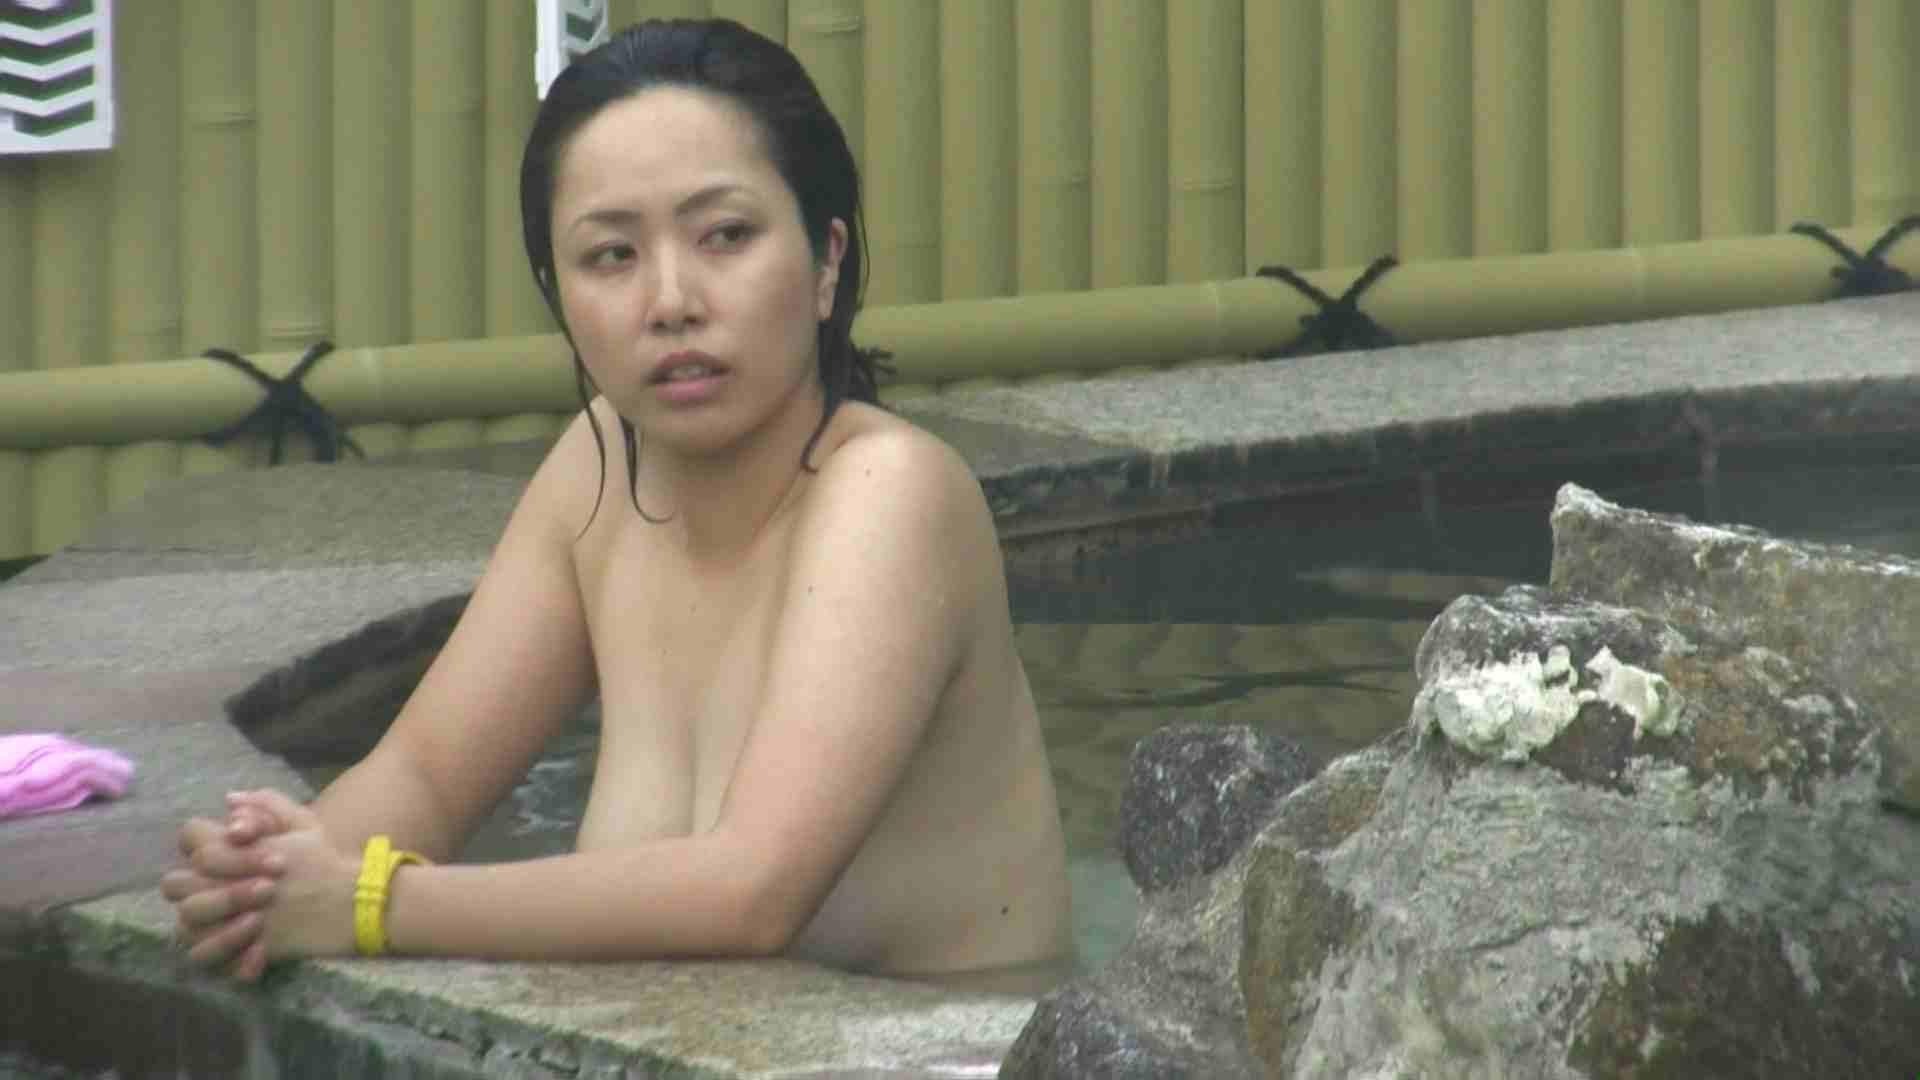 Aquaな露天風呂Vol.604 美しいOLの裸体 AV無料 78pic 5